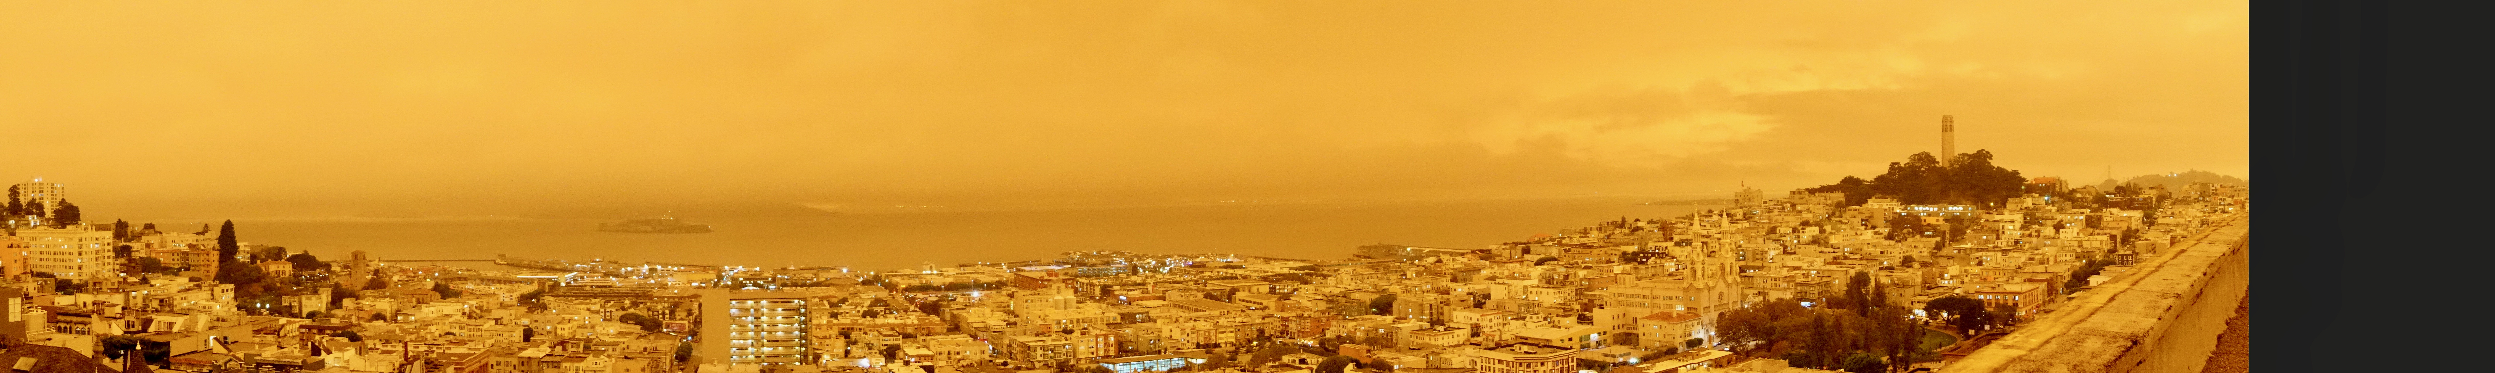 sepia/yellow skies over San Francisco